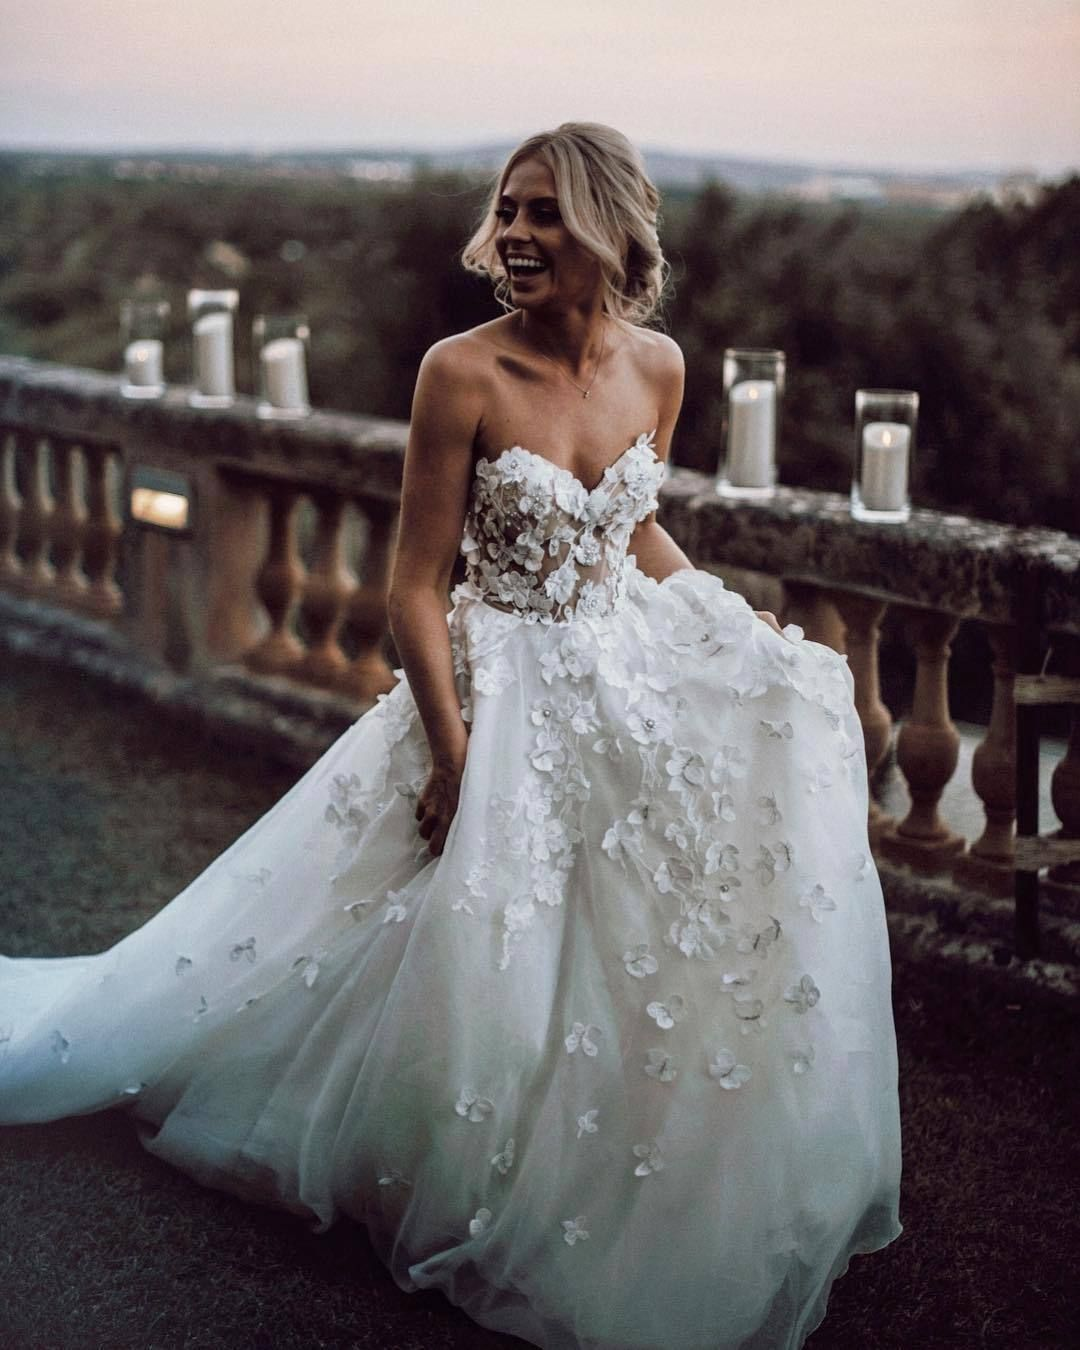 Chic Ivory Wedding Dress Lace Cheap Beautiful Wedding Dress Vb2636 Tulle Wedding Dress Wedding Dresses Applique Wedding Dress [ 1350 x 1080 Pixel ]